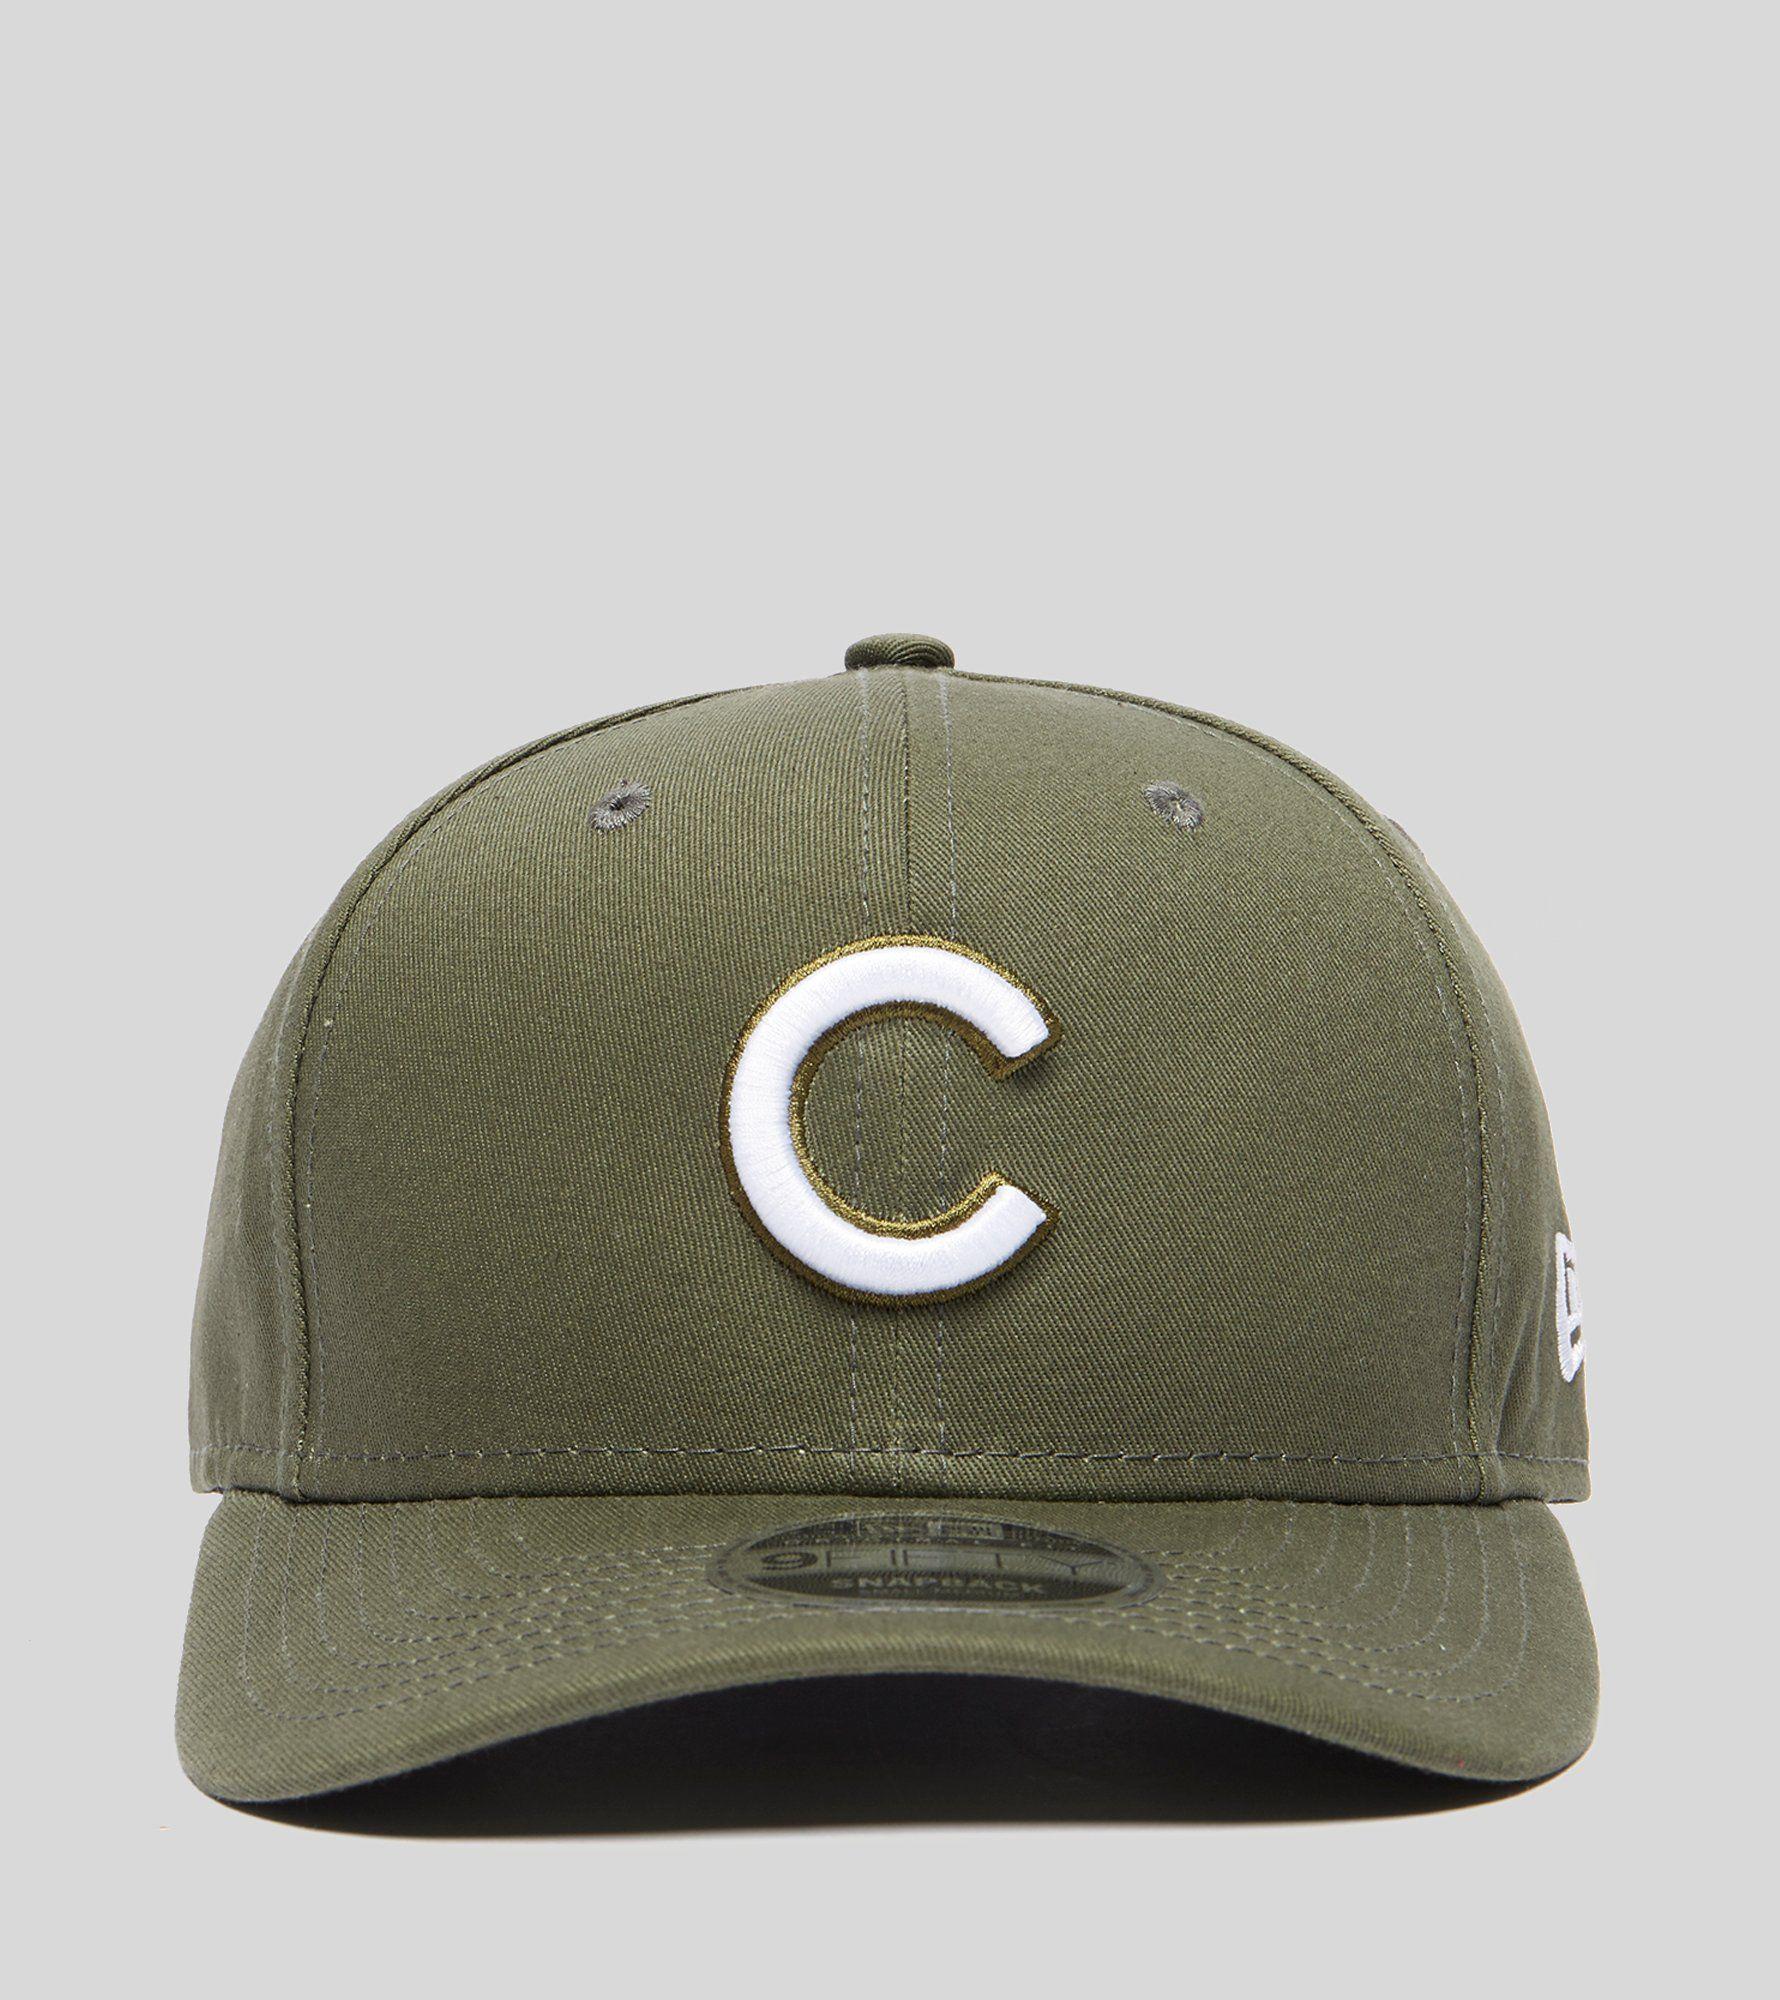 New Era 9FIFTY Chicago Cubs Cap